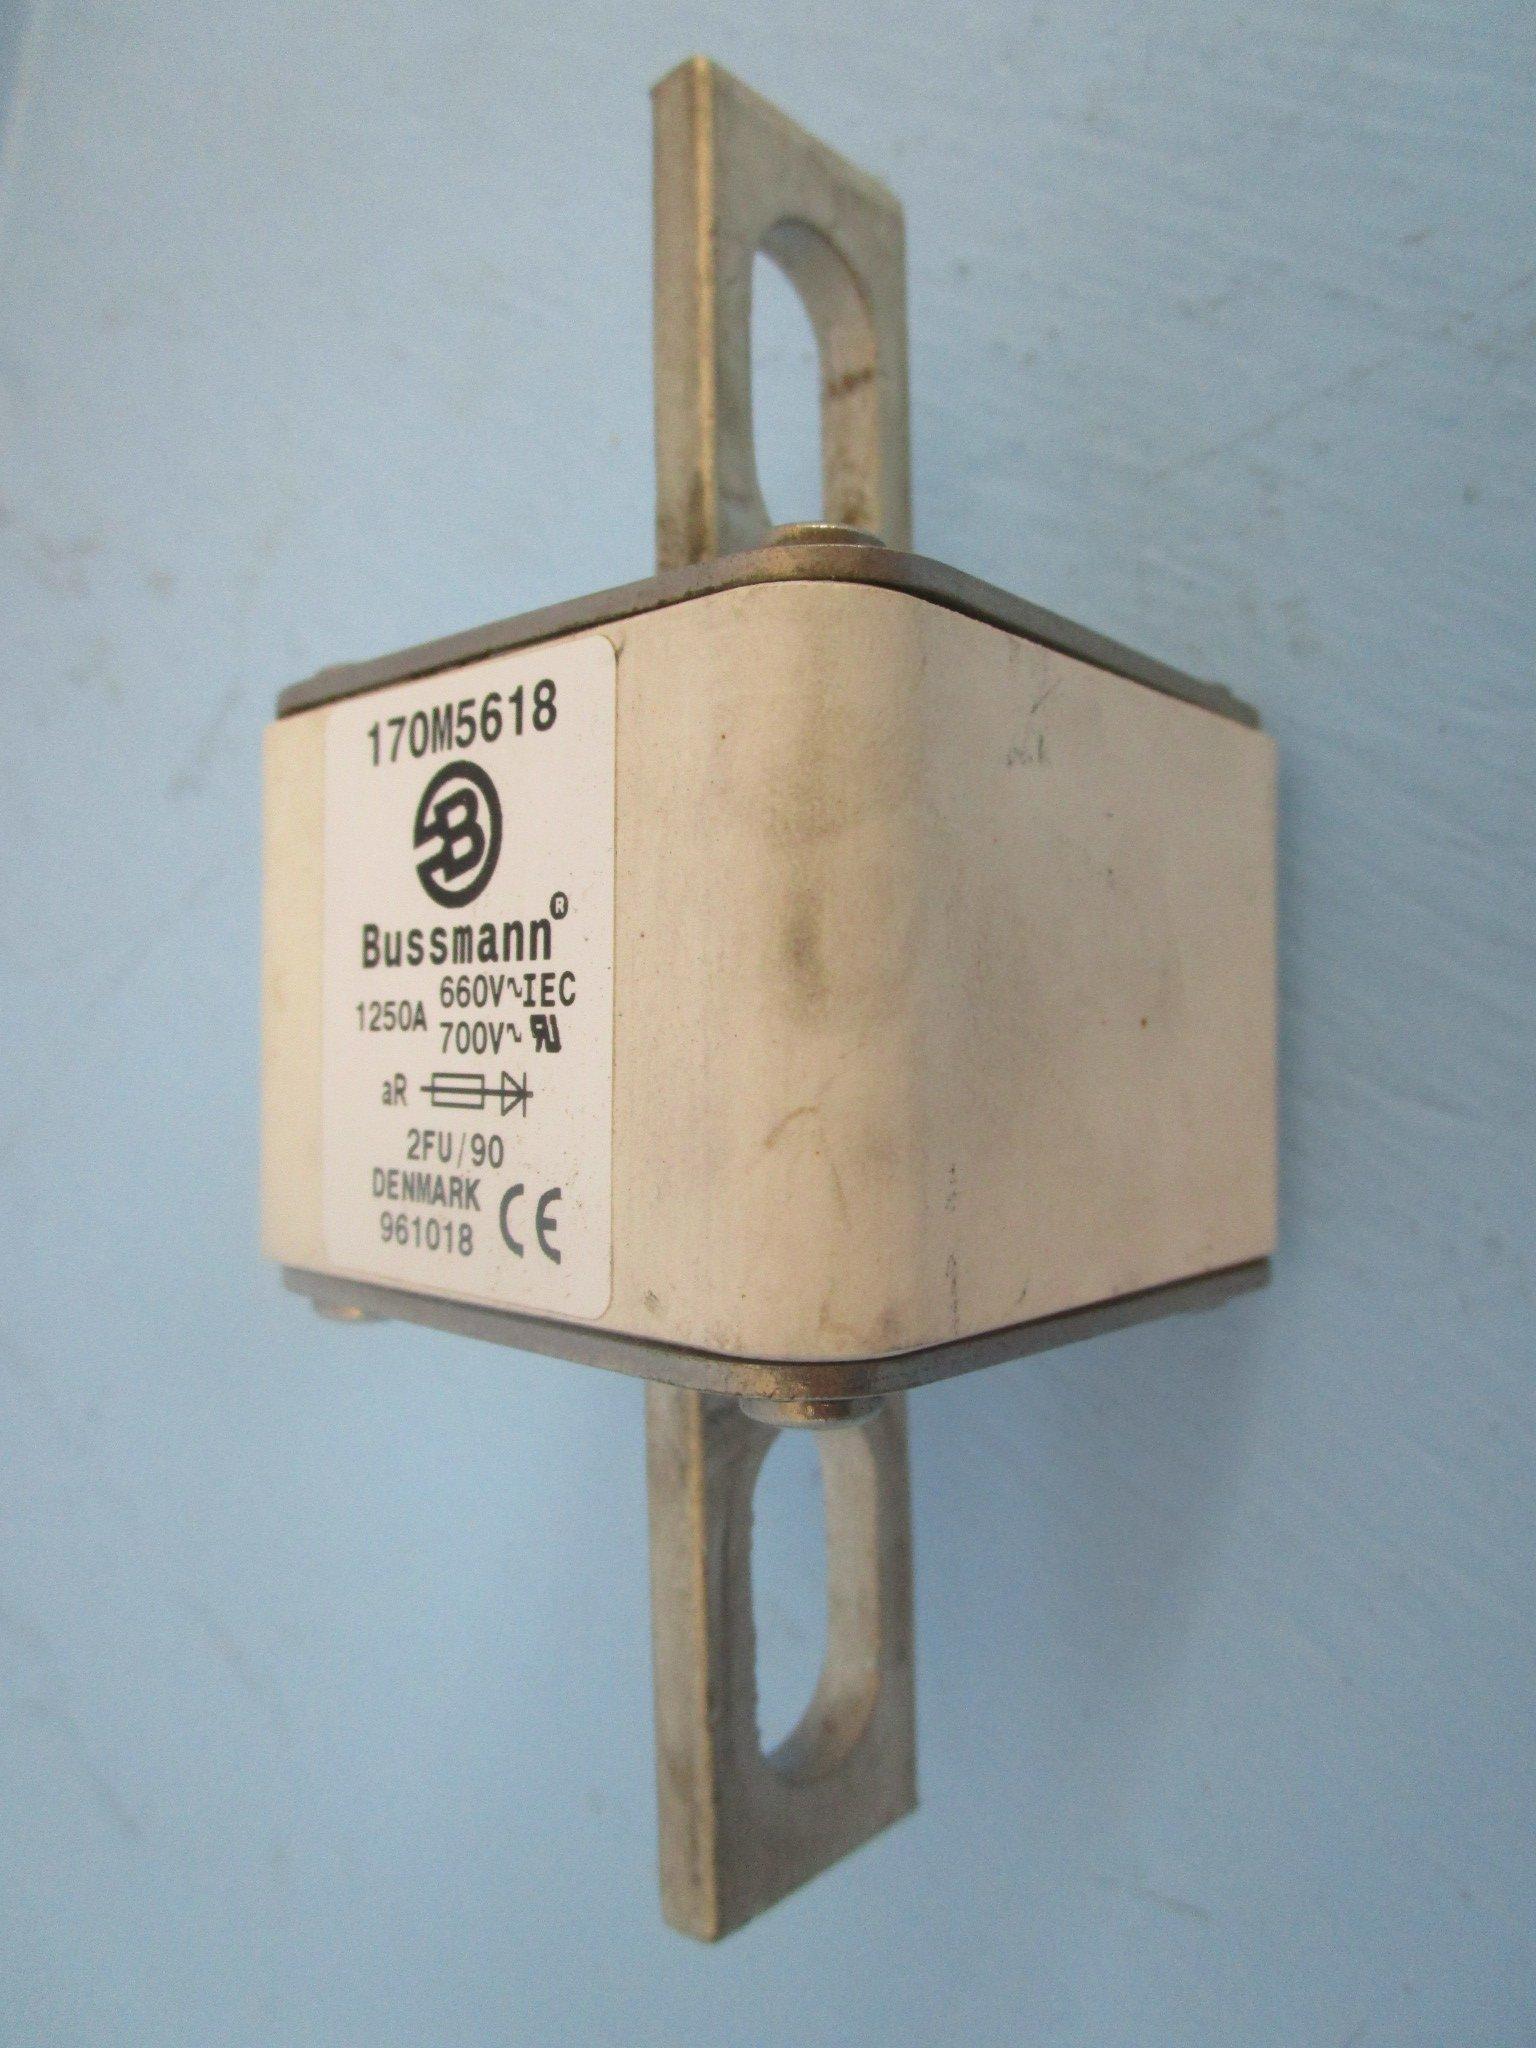 Bussmann 170M5618 1250A 660V~IEC 700V~RU 2FU/90 Denmark 961018 Fuse 1250 Amp A